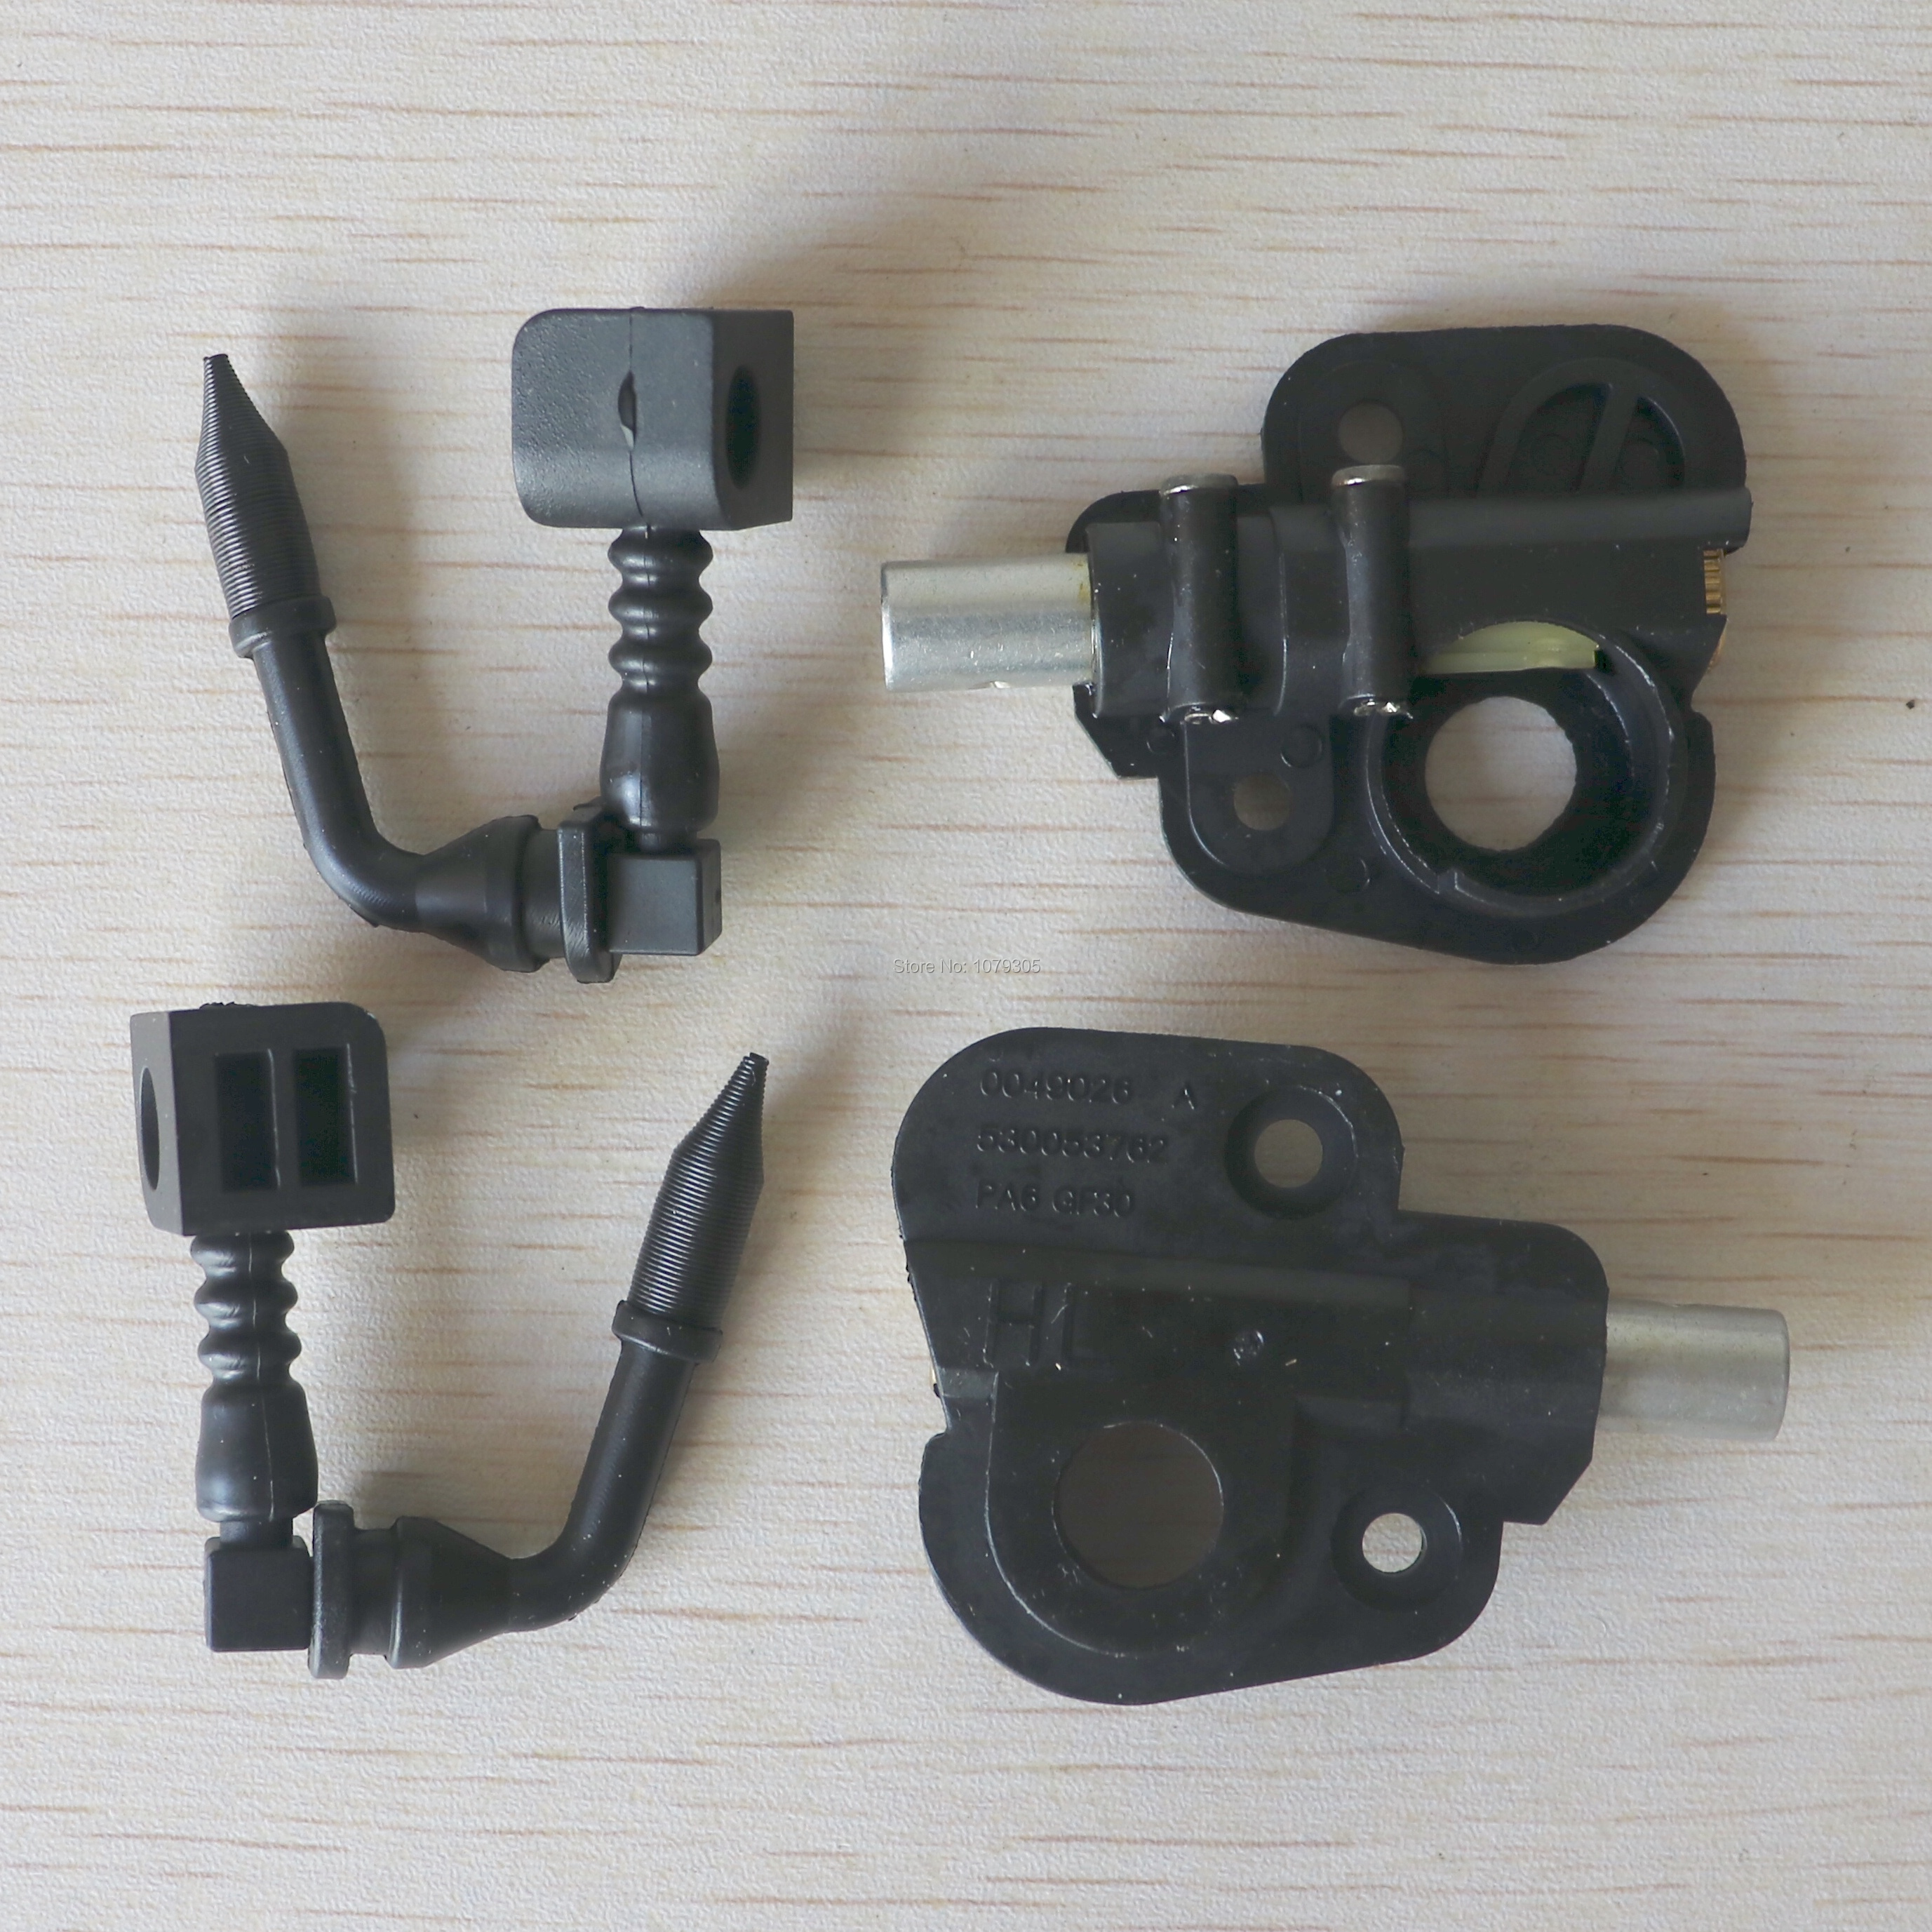 2pcs Oil Pump Fit For Partner 350 351 352 370 371 390 391 401 420 422 Chainsaw Spare Parts